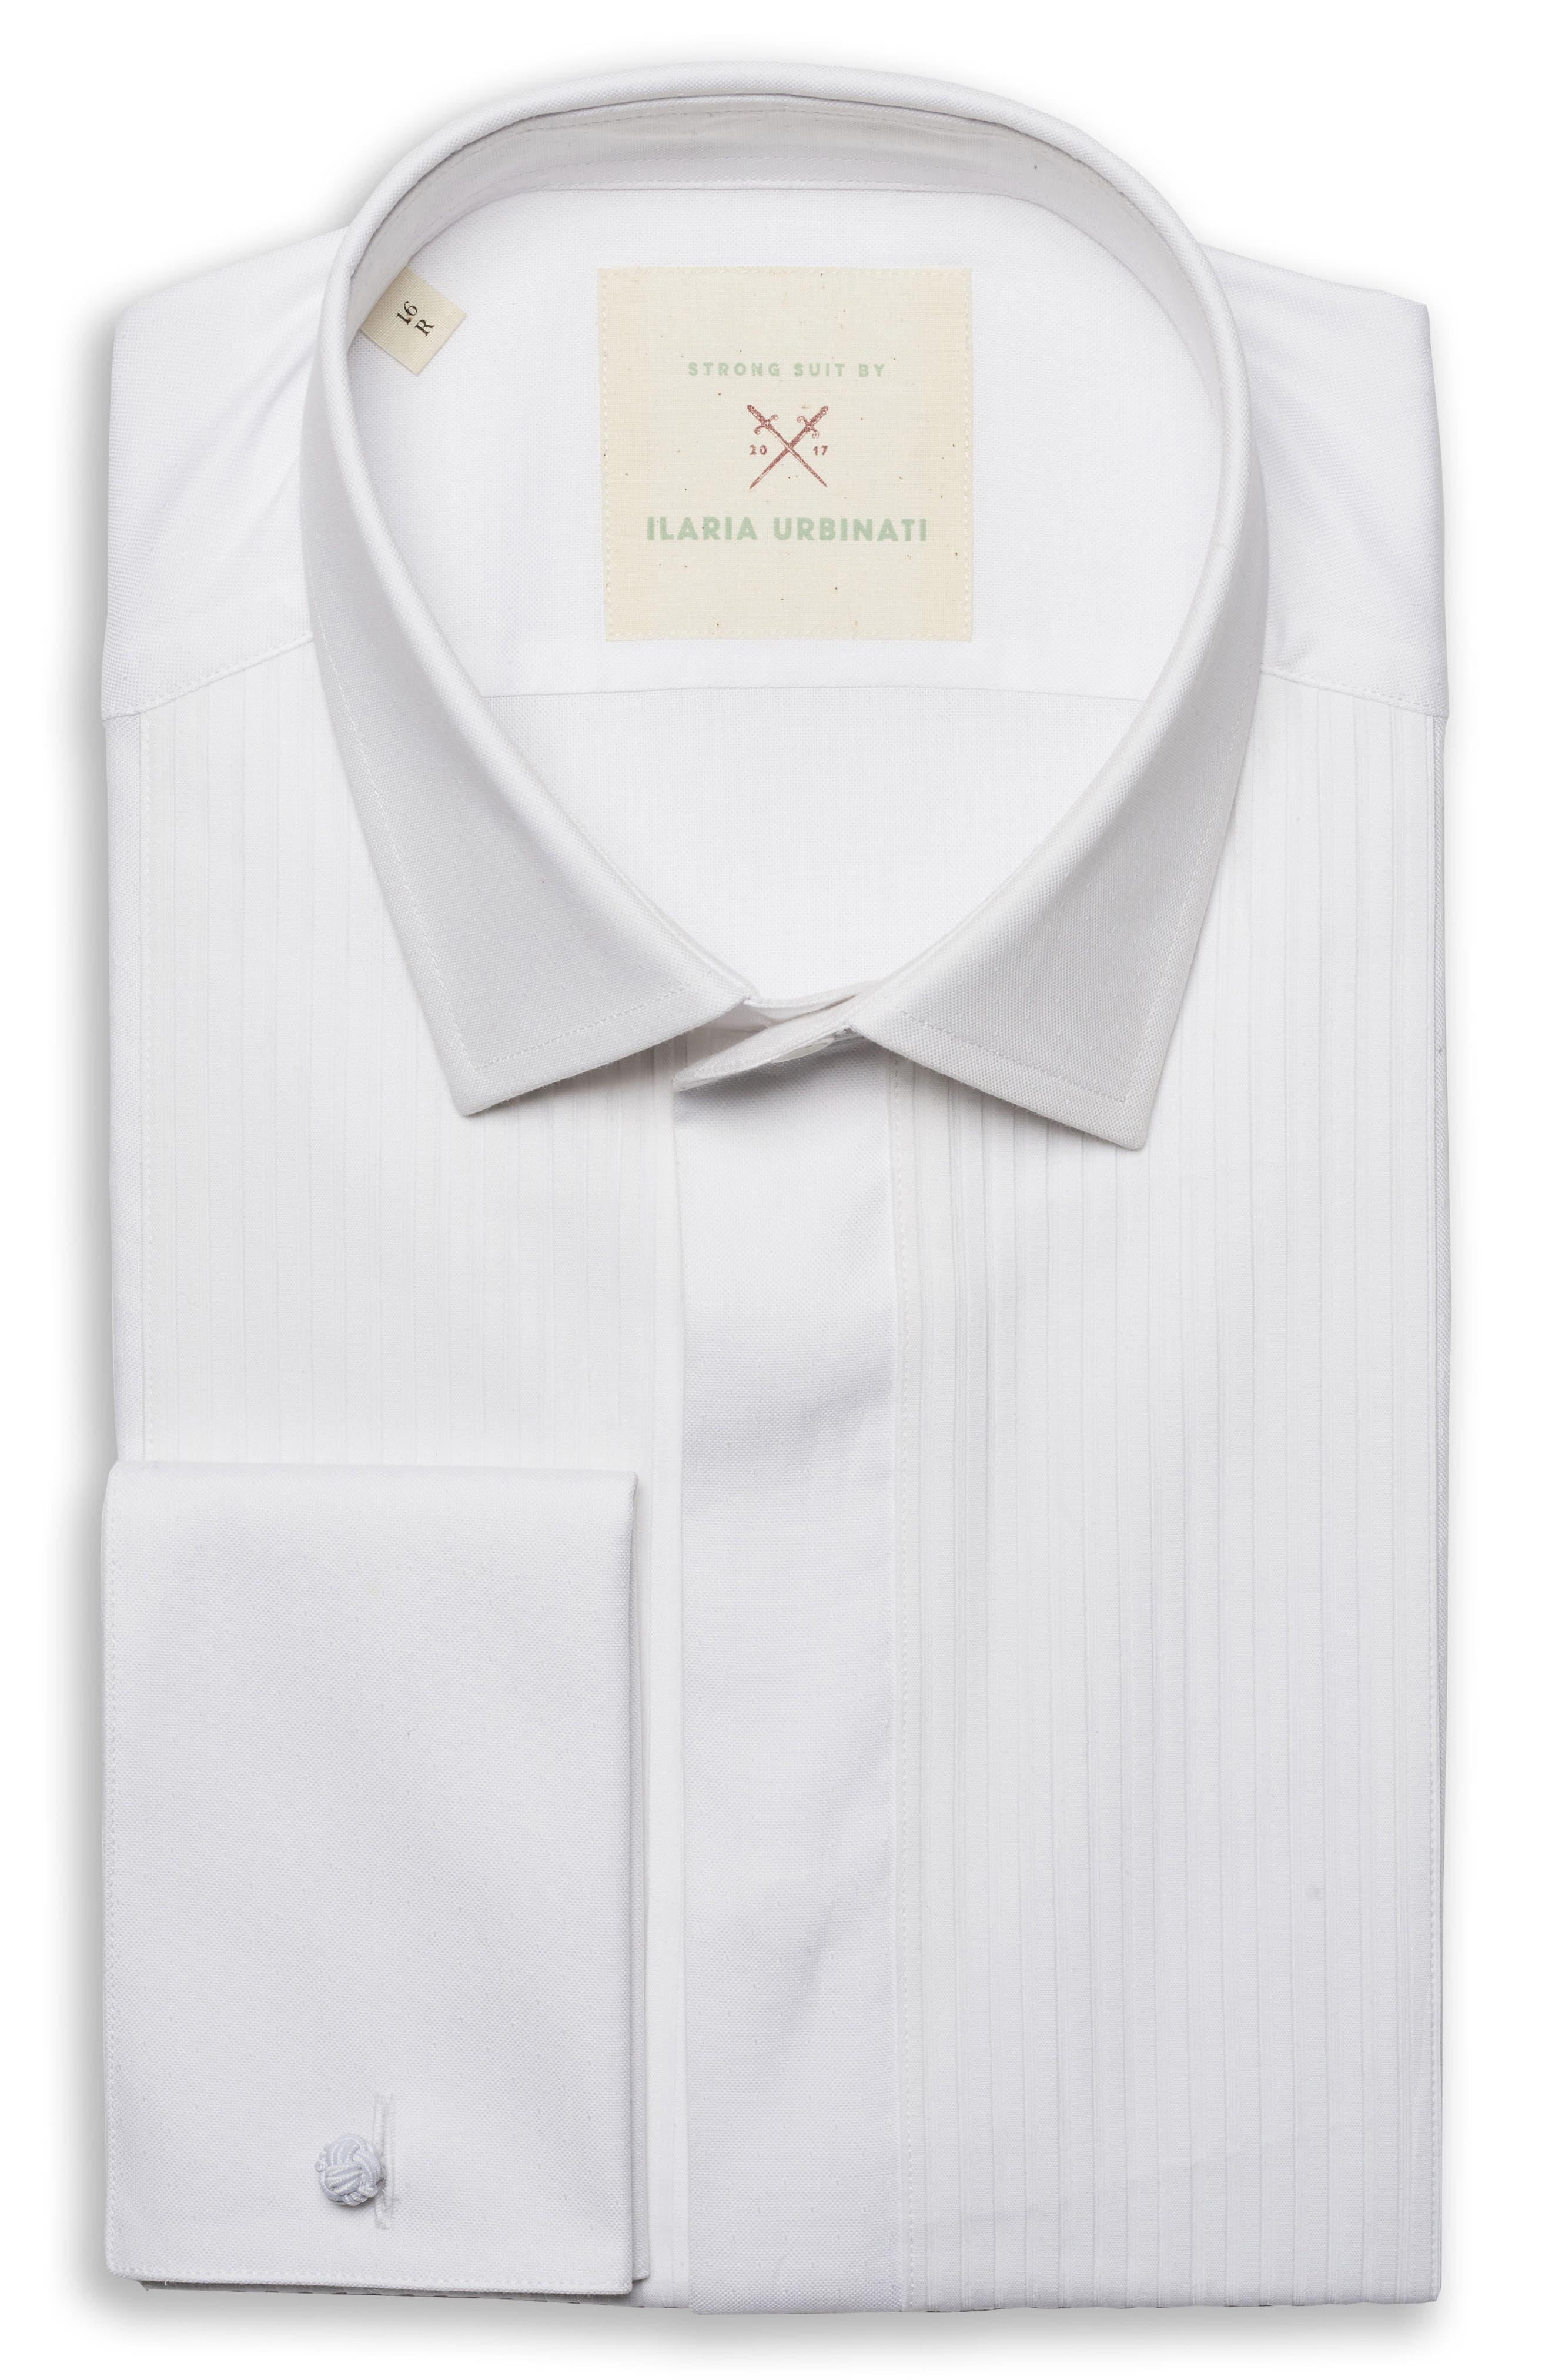 by Ilaria Urbinati Slim Fit Tuxedo Shirt,                         Main,                         color, 106